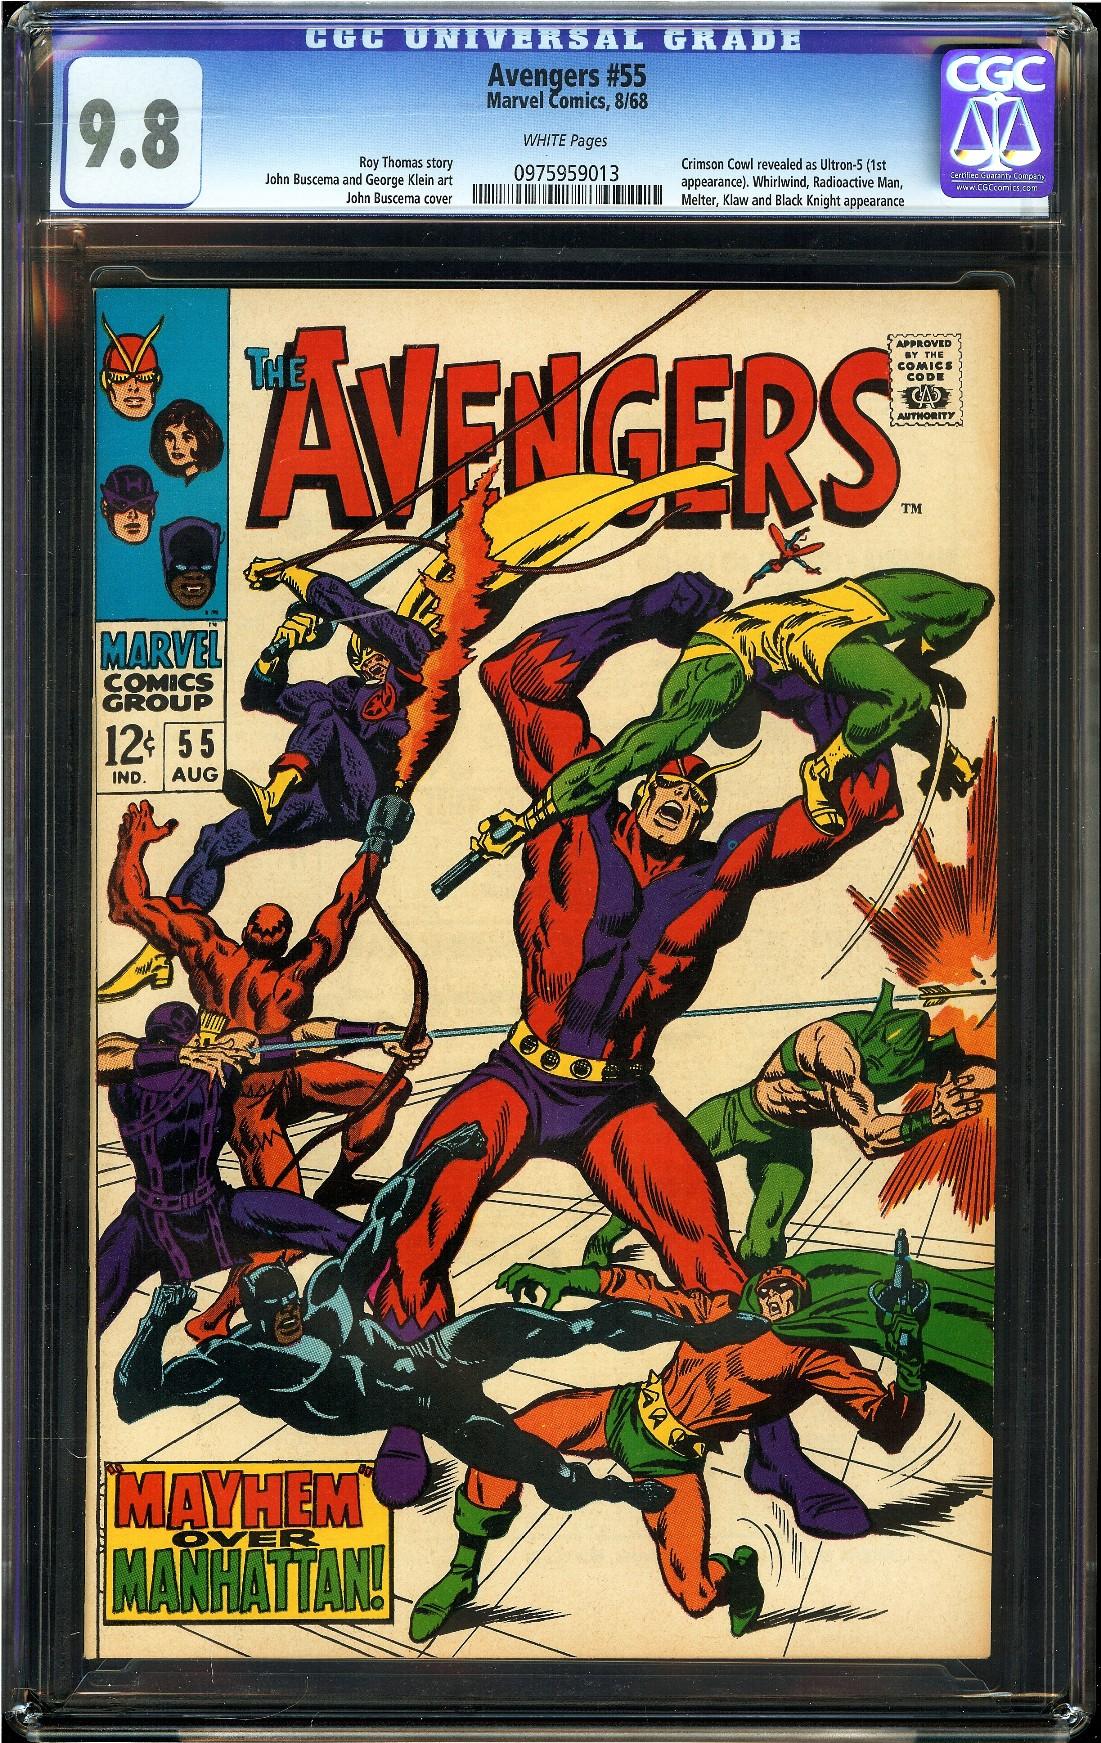 Have Comics Peaked?